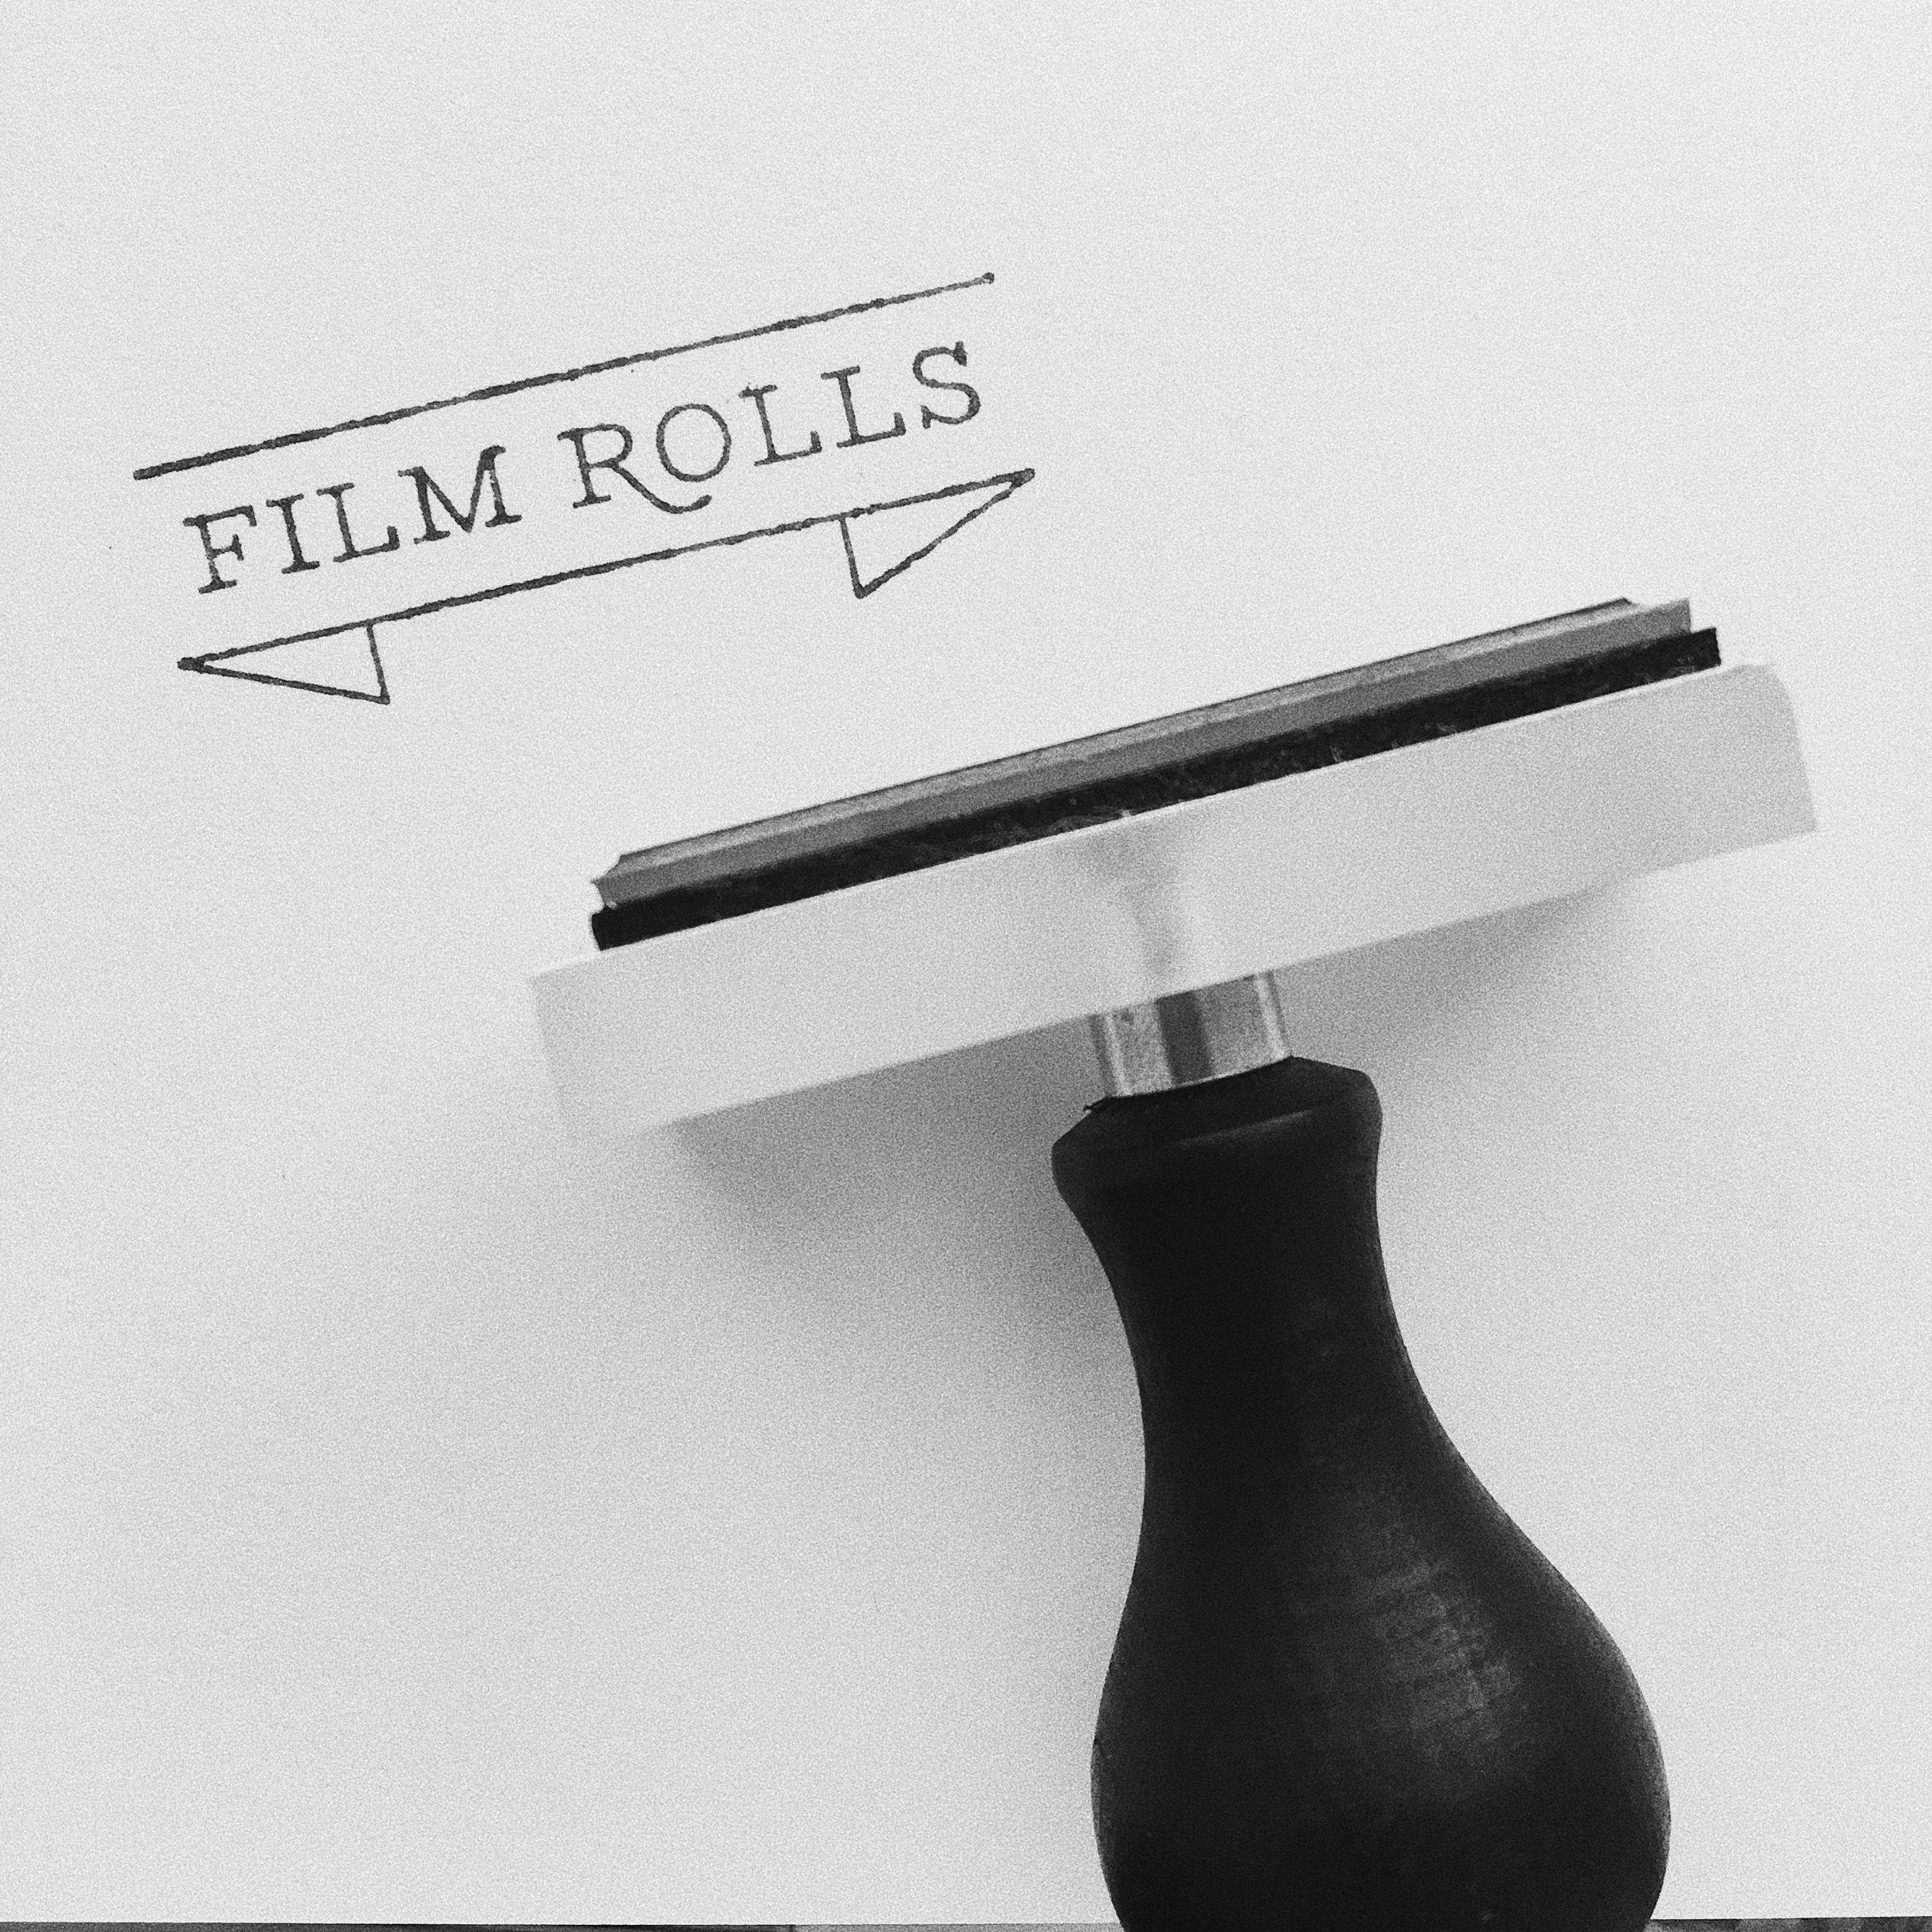 AMYFILMPHOTO FILM ROLLS RUBBER STAMP (2).JPG